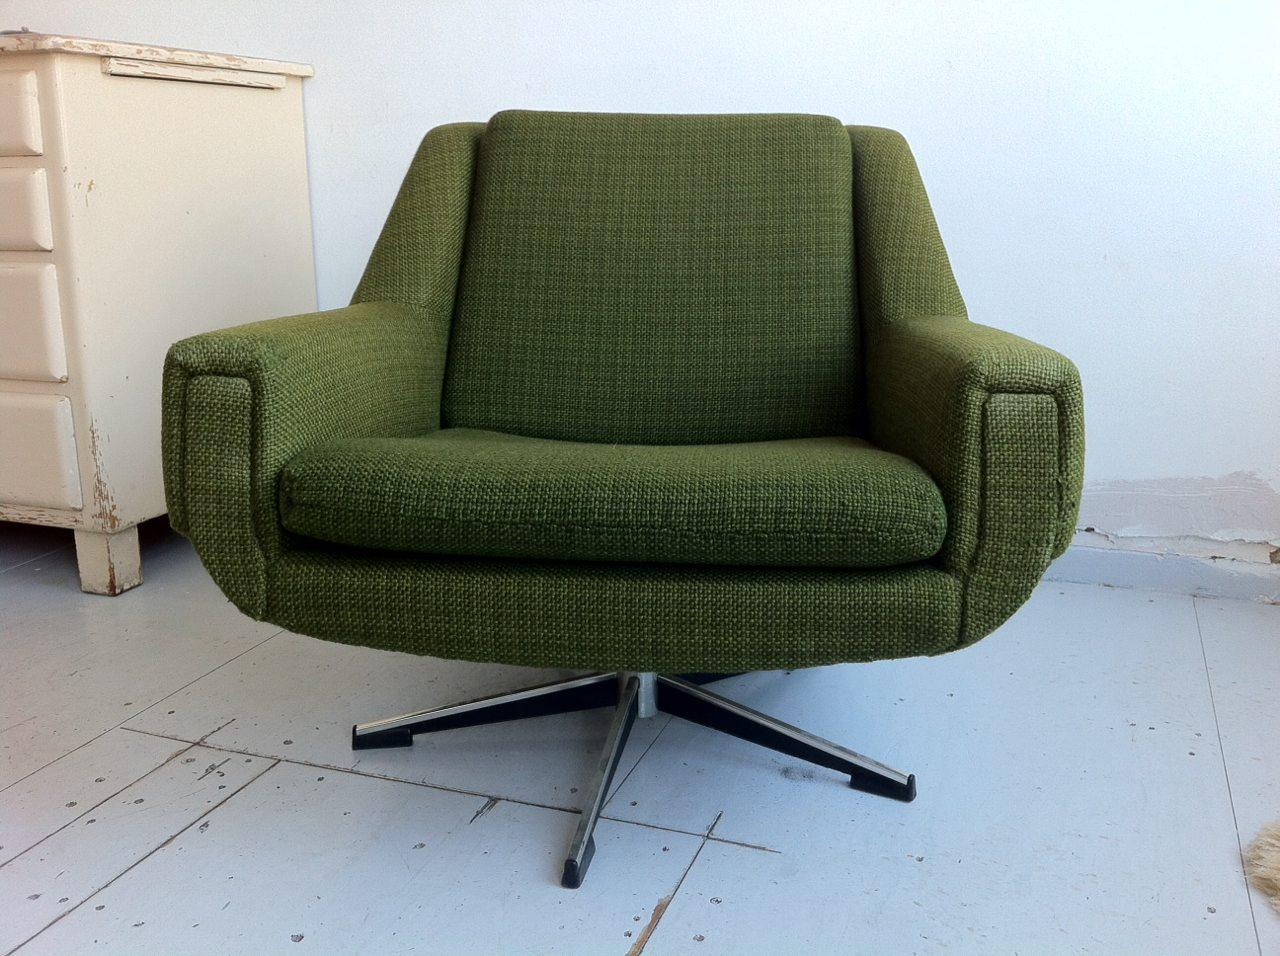 Vintage fauteuil draaistoel groene stof met sterpoot - Fauteuil retro ...